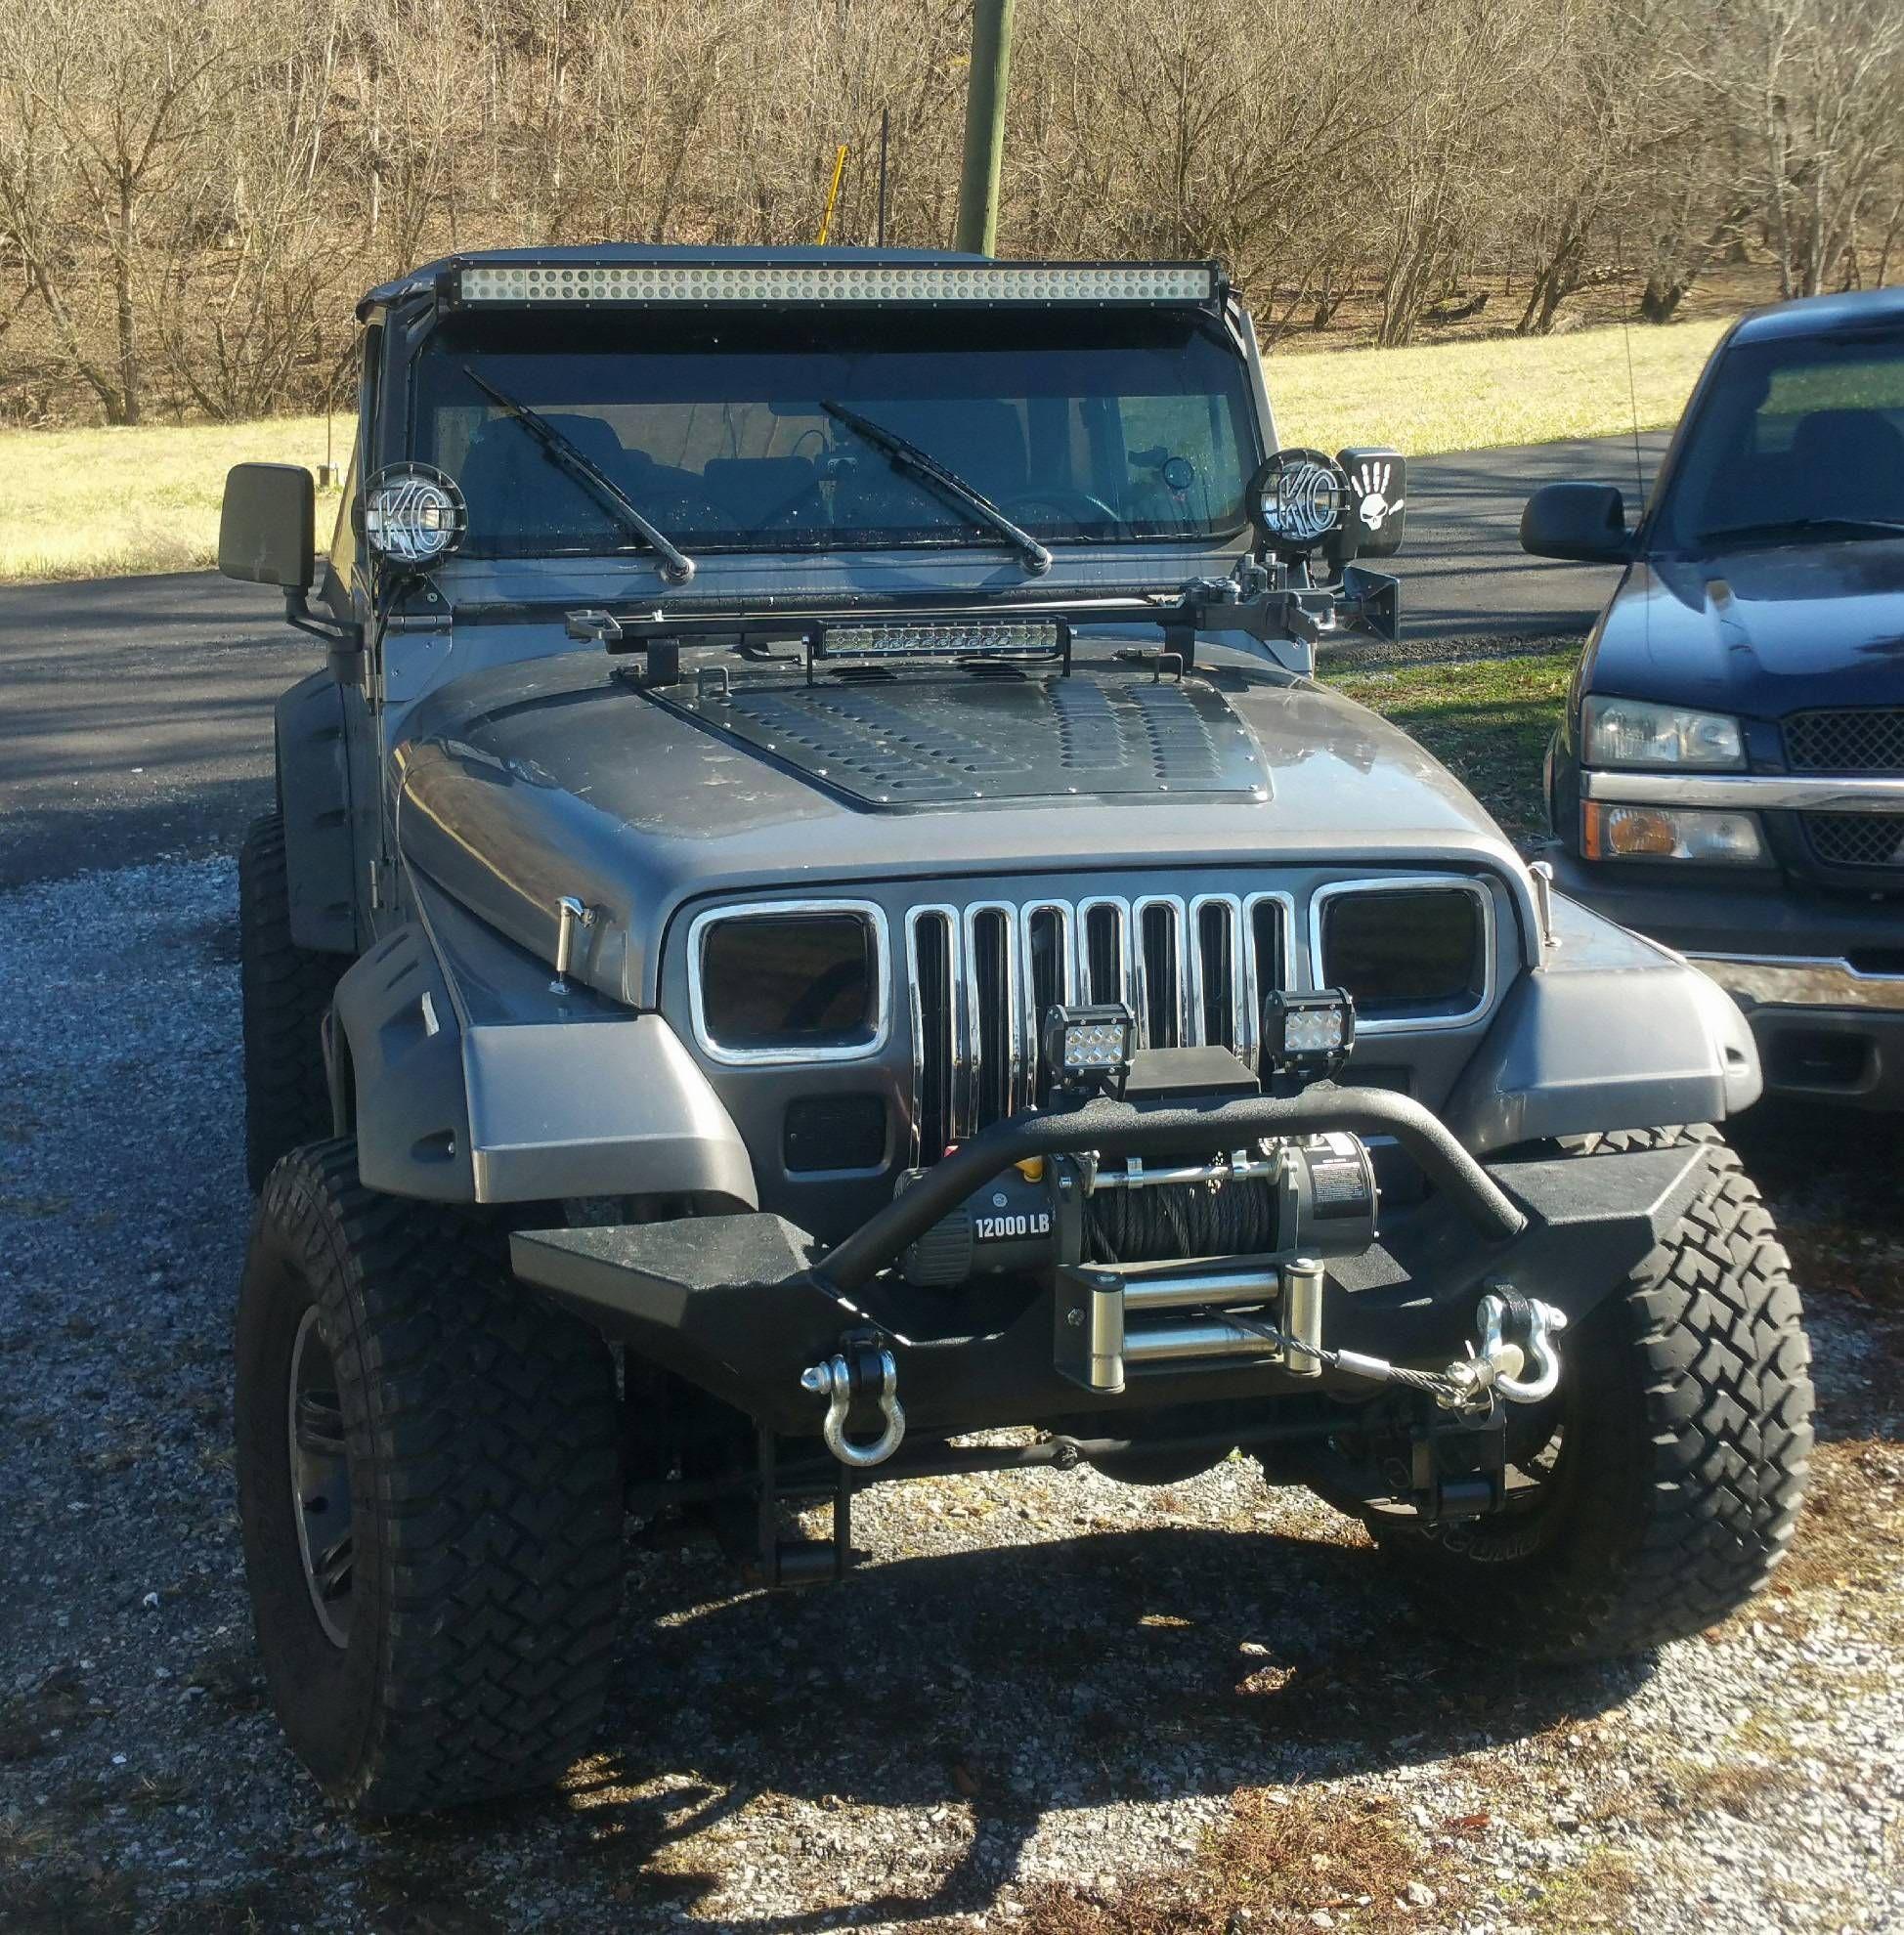 [YJ] I need a new windshield banner idea folks! #jeep #jeeplife